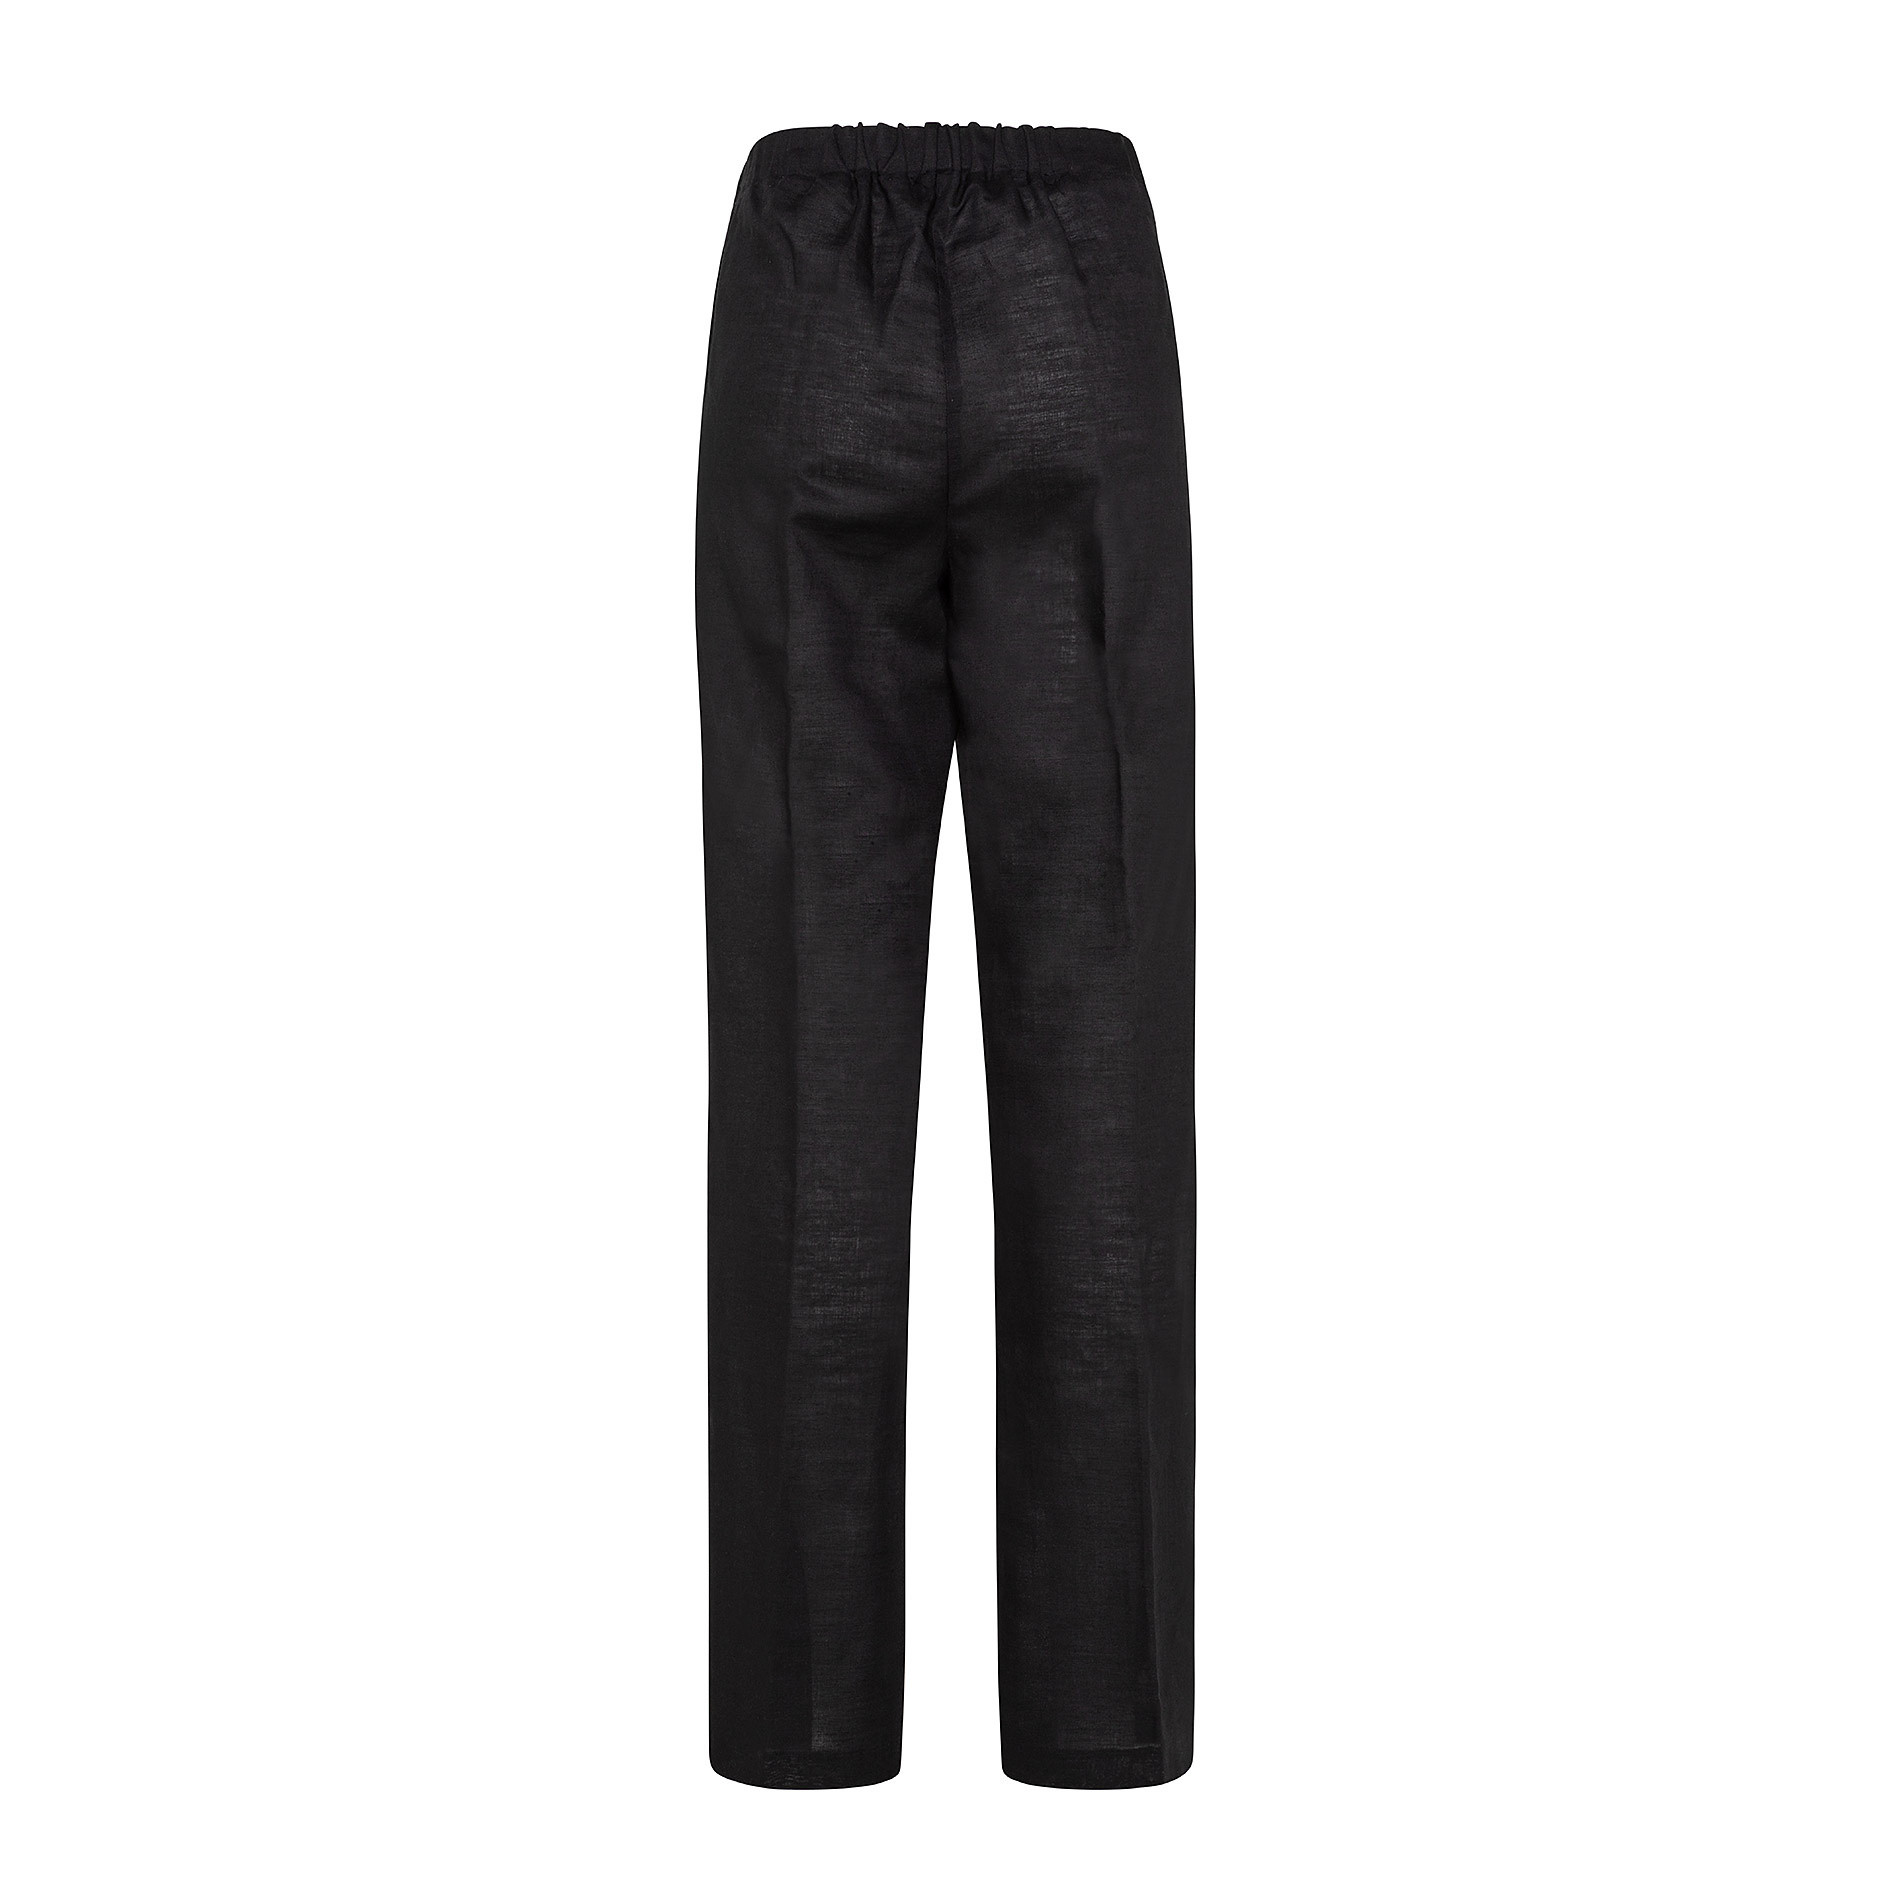 Pantalone misto lino con elastico Koan, Nero, large image number 1